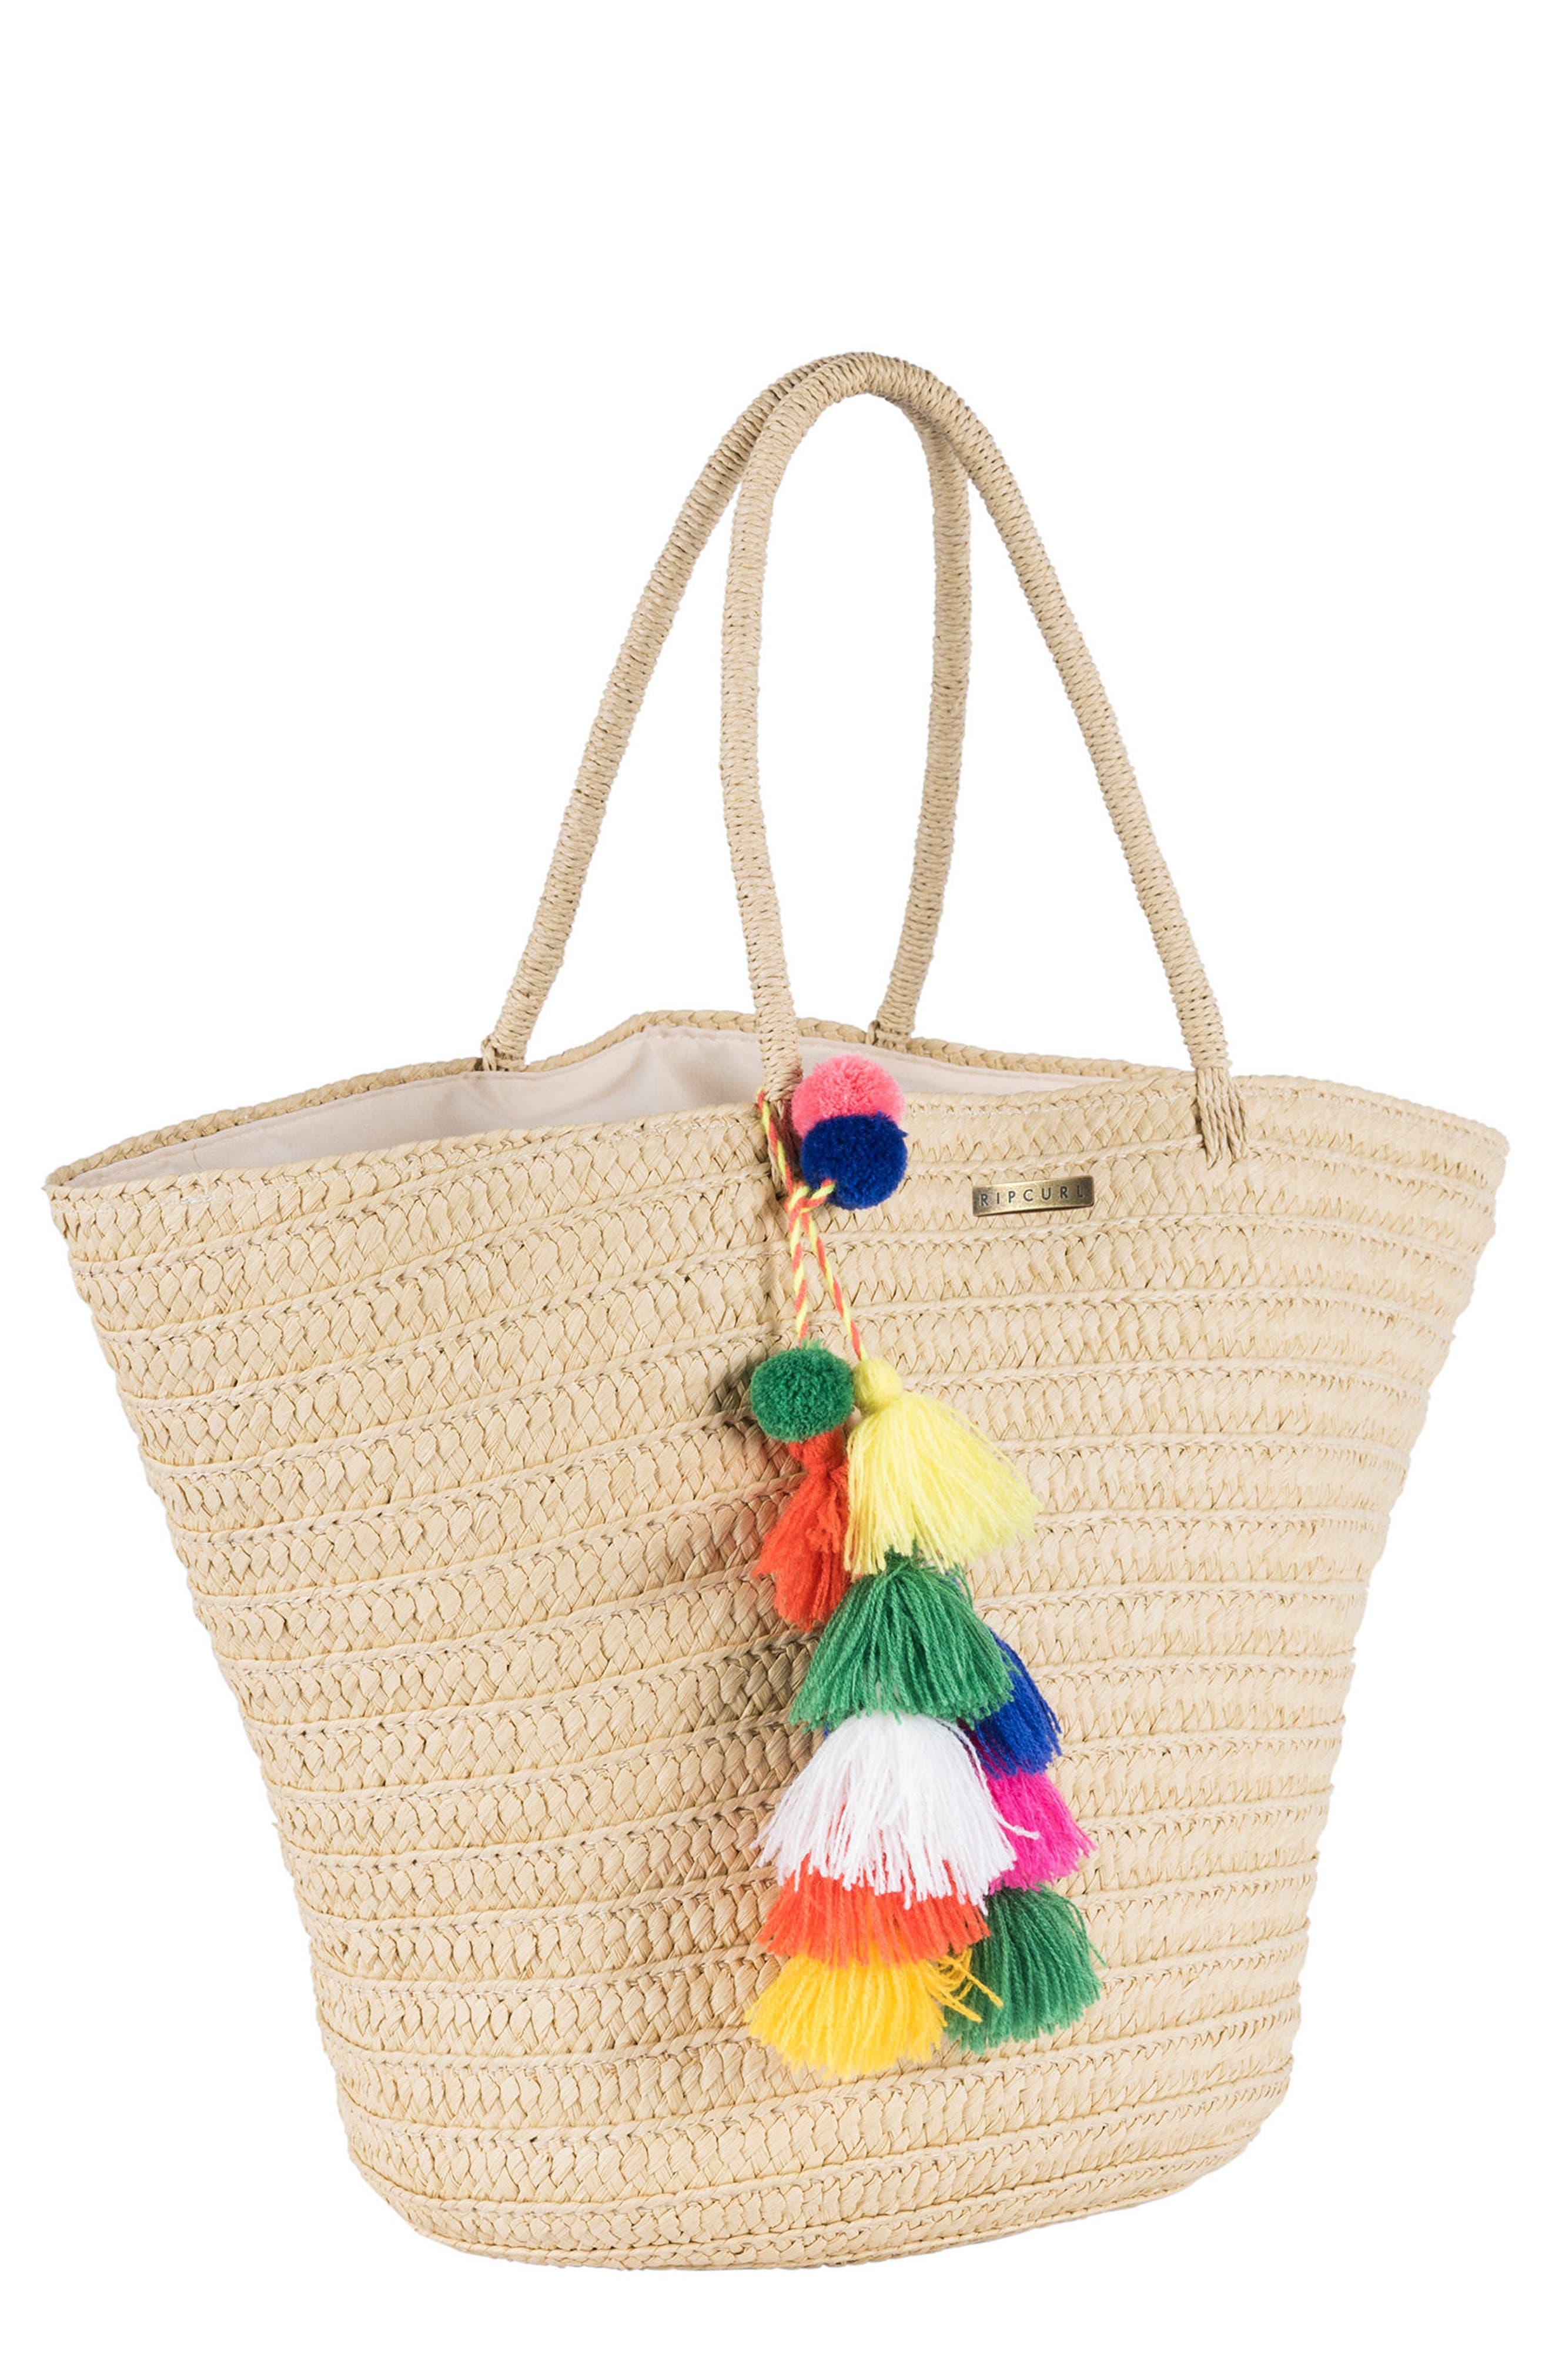 Beach Bazaar Straw Bag,                             Main thumbnail 1, color,